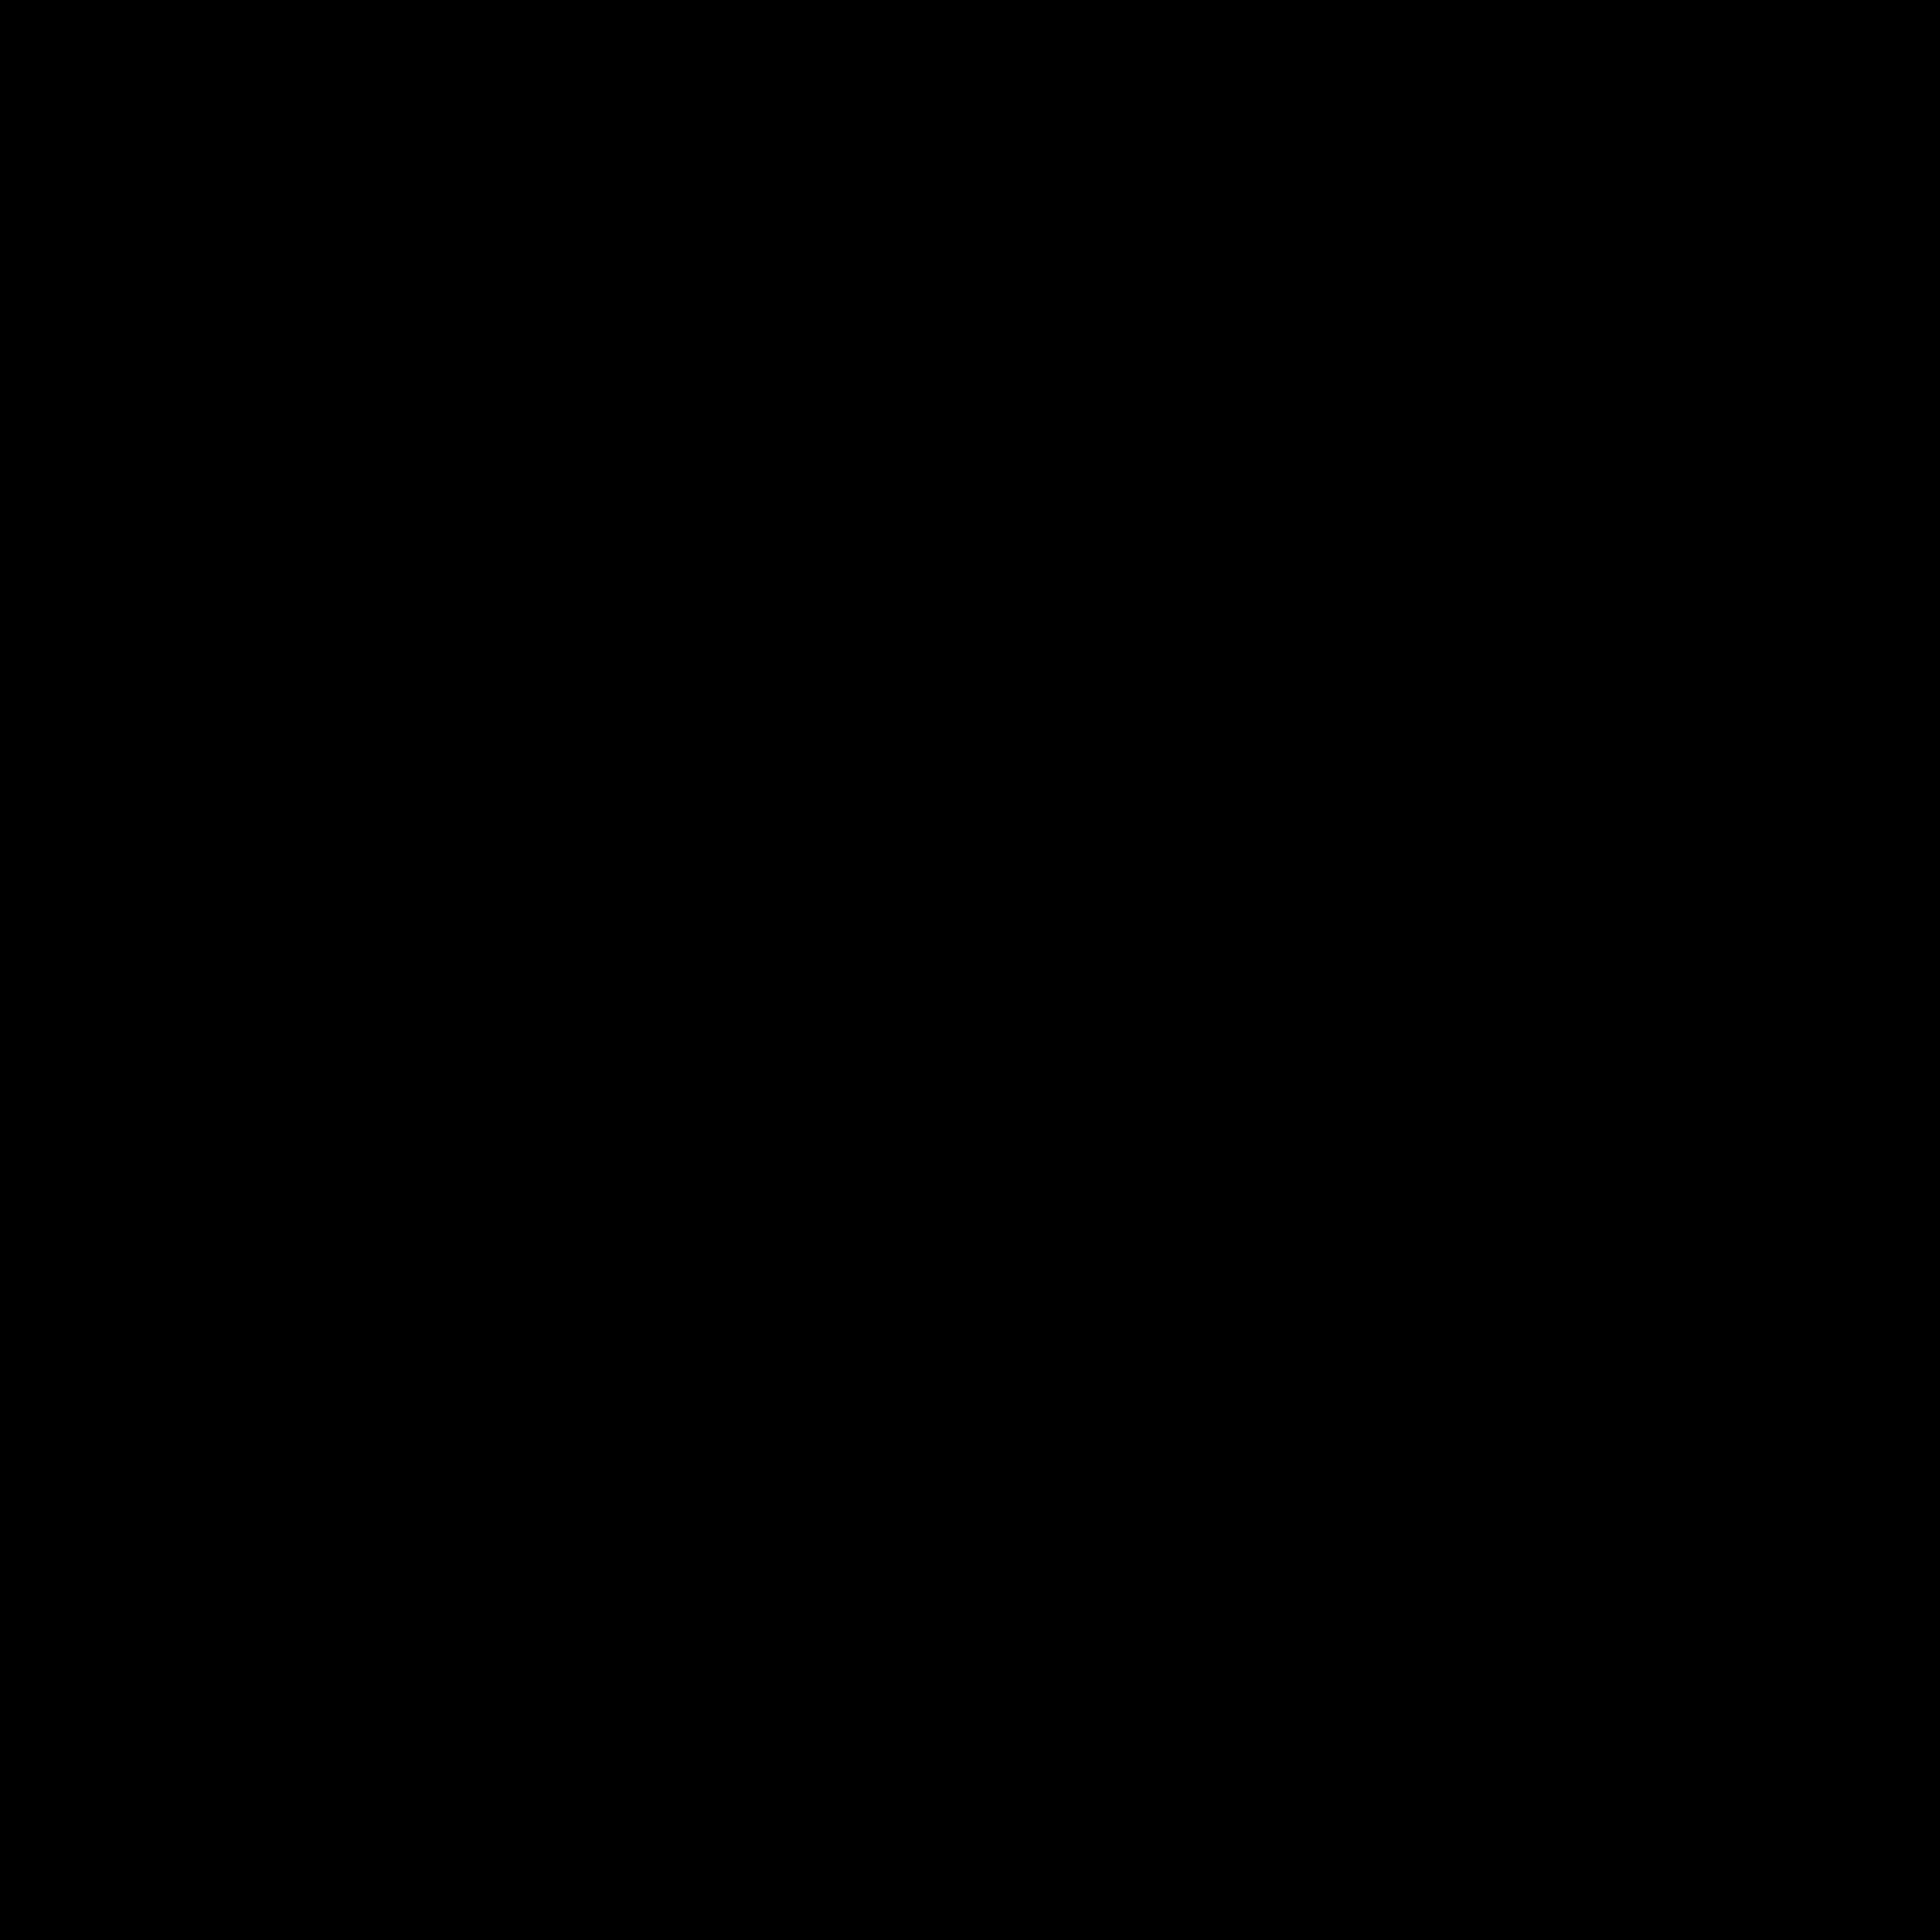 Naklejka na ścianę eskimos